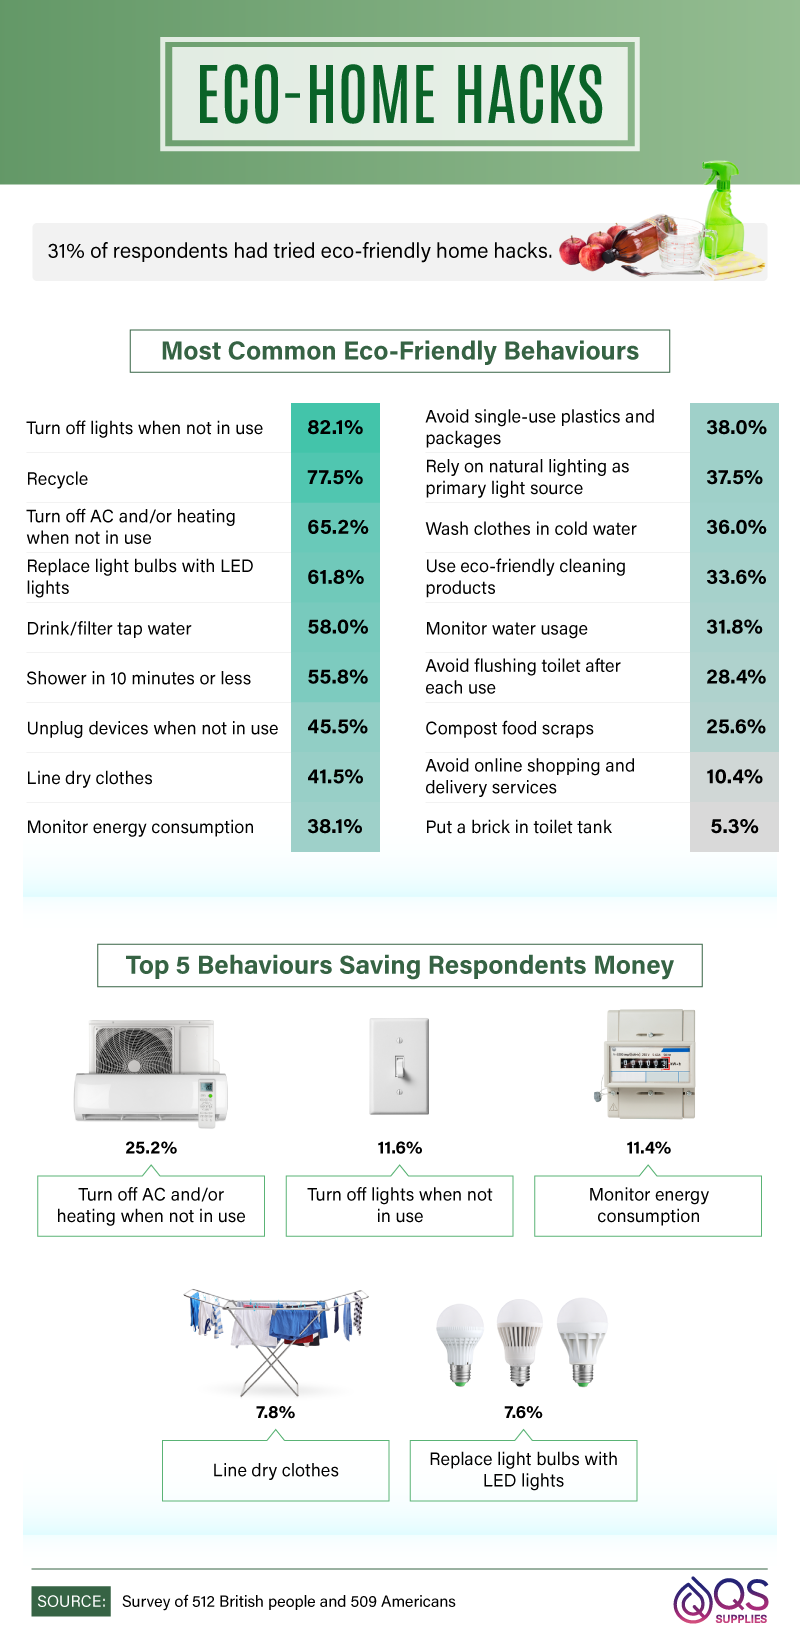 Most common eco-friendly behaviours.